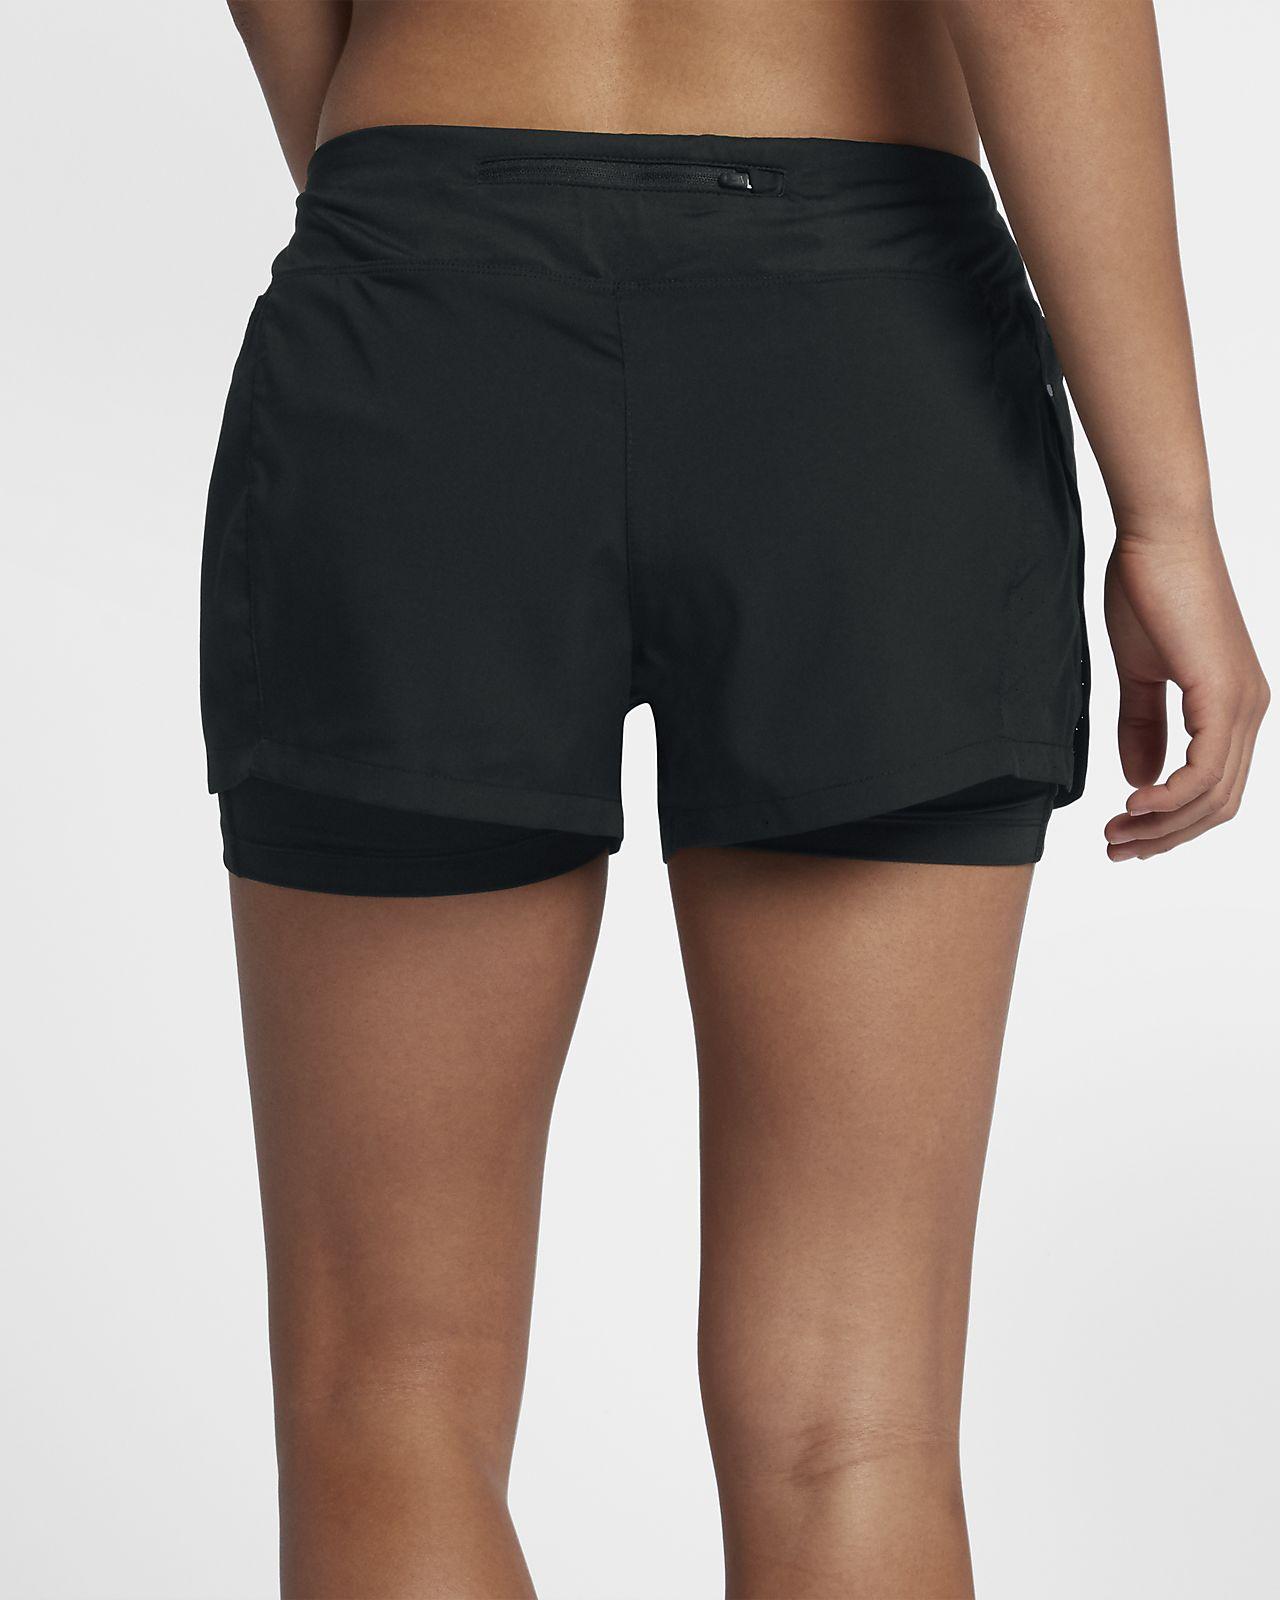 cortos para deportivos Nike Pantalones mujer Eclipse ZXukOPi